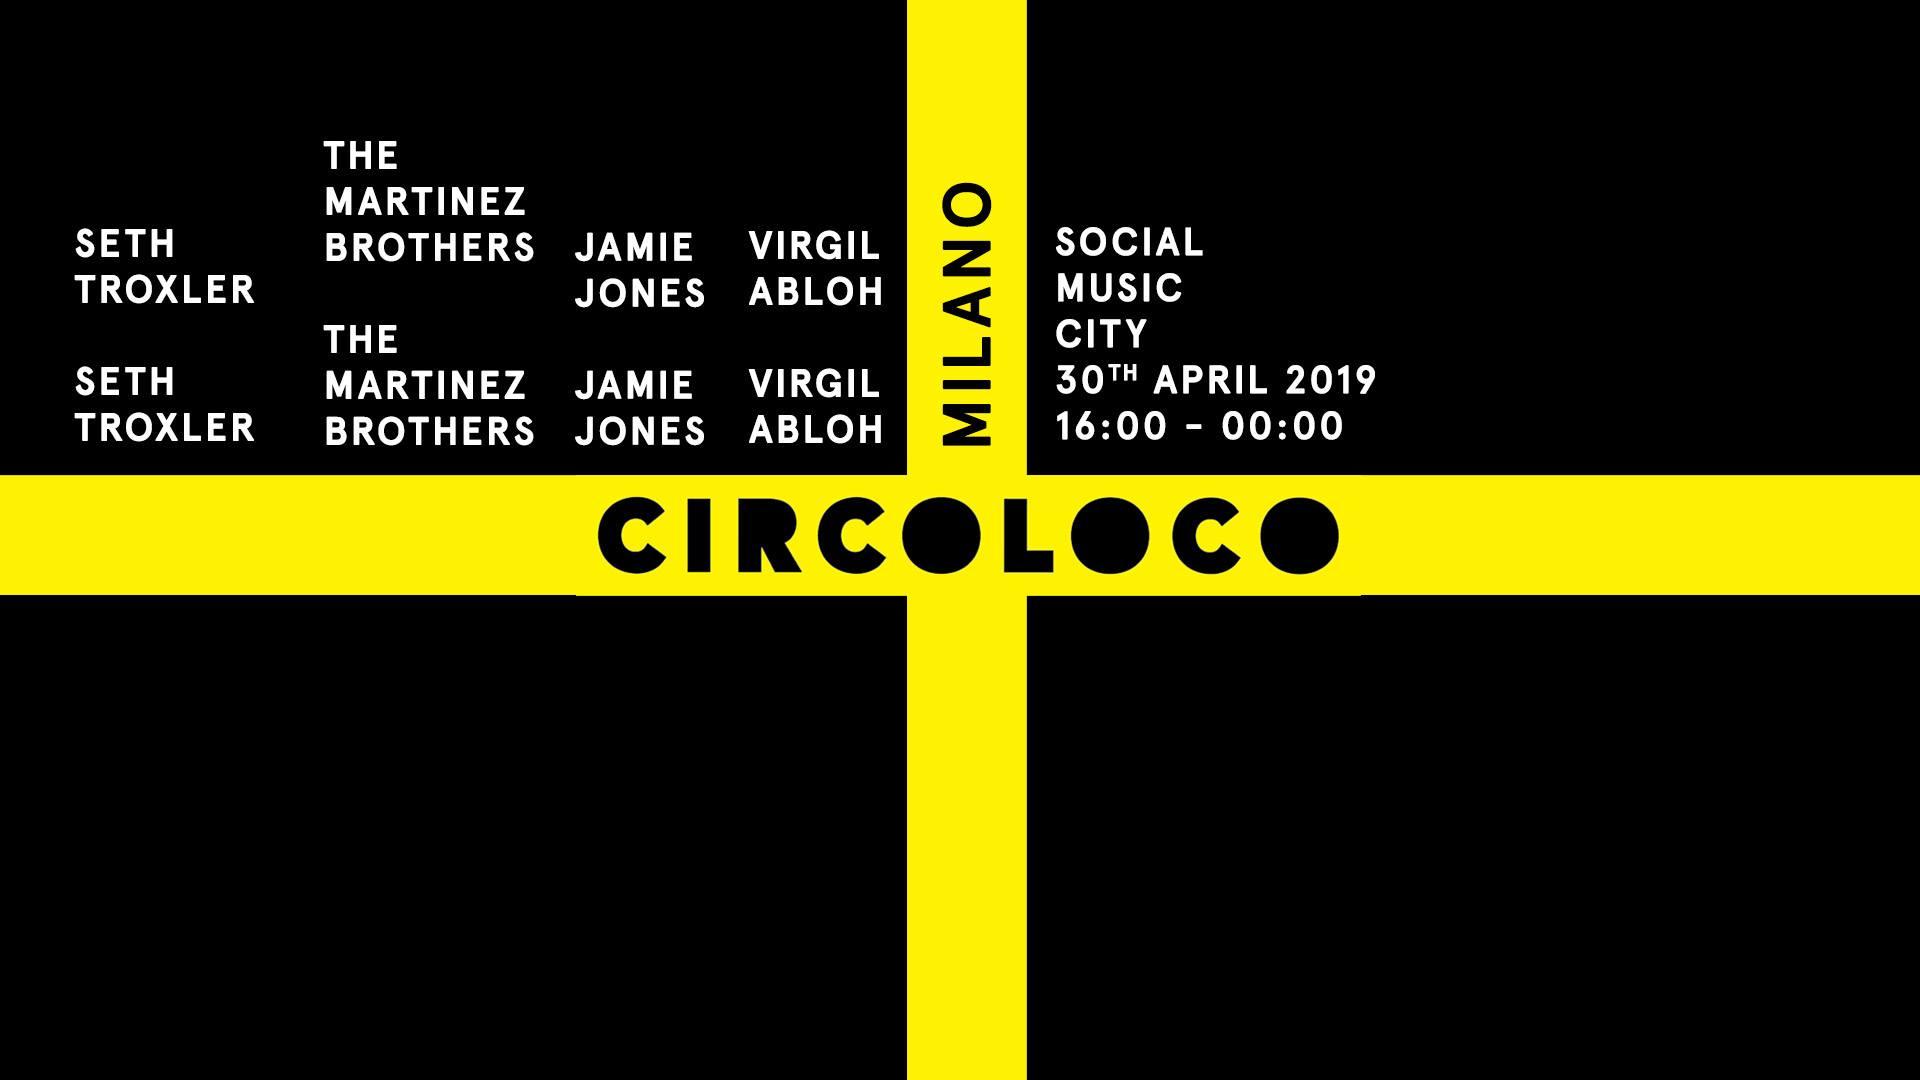 Circoloco Milano Social Music City 30 Aprile 2019